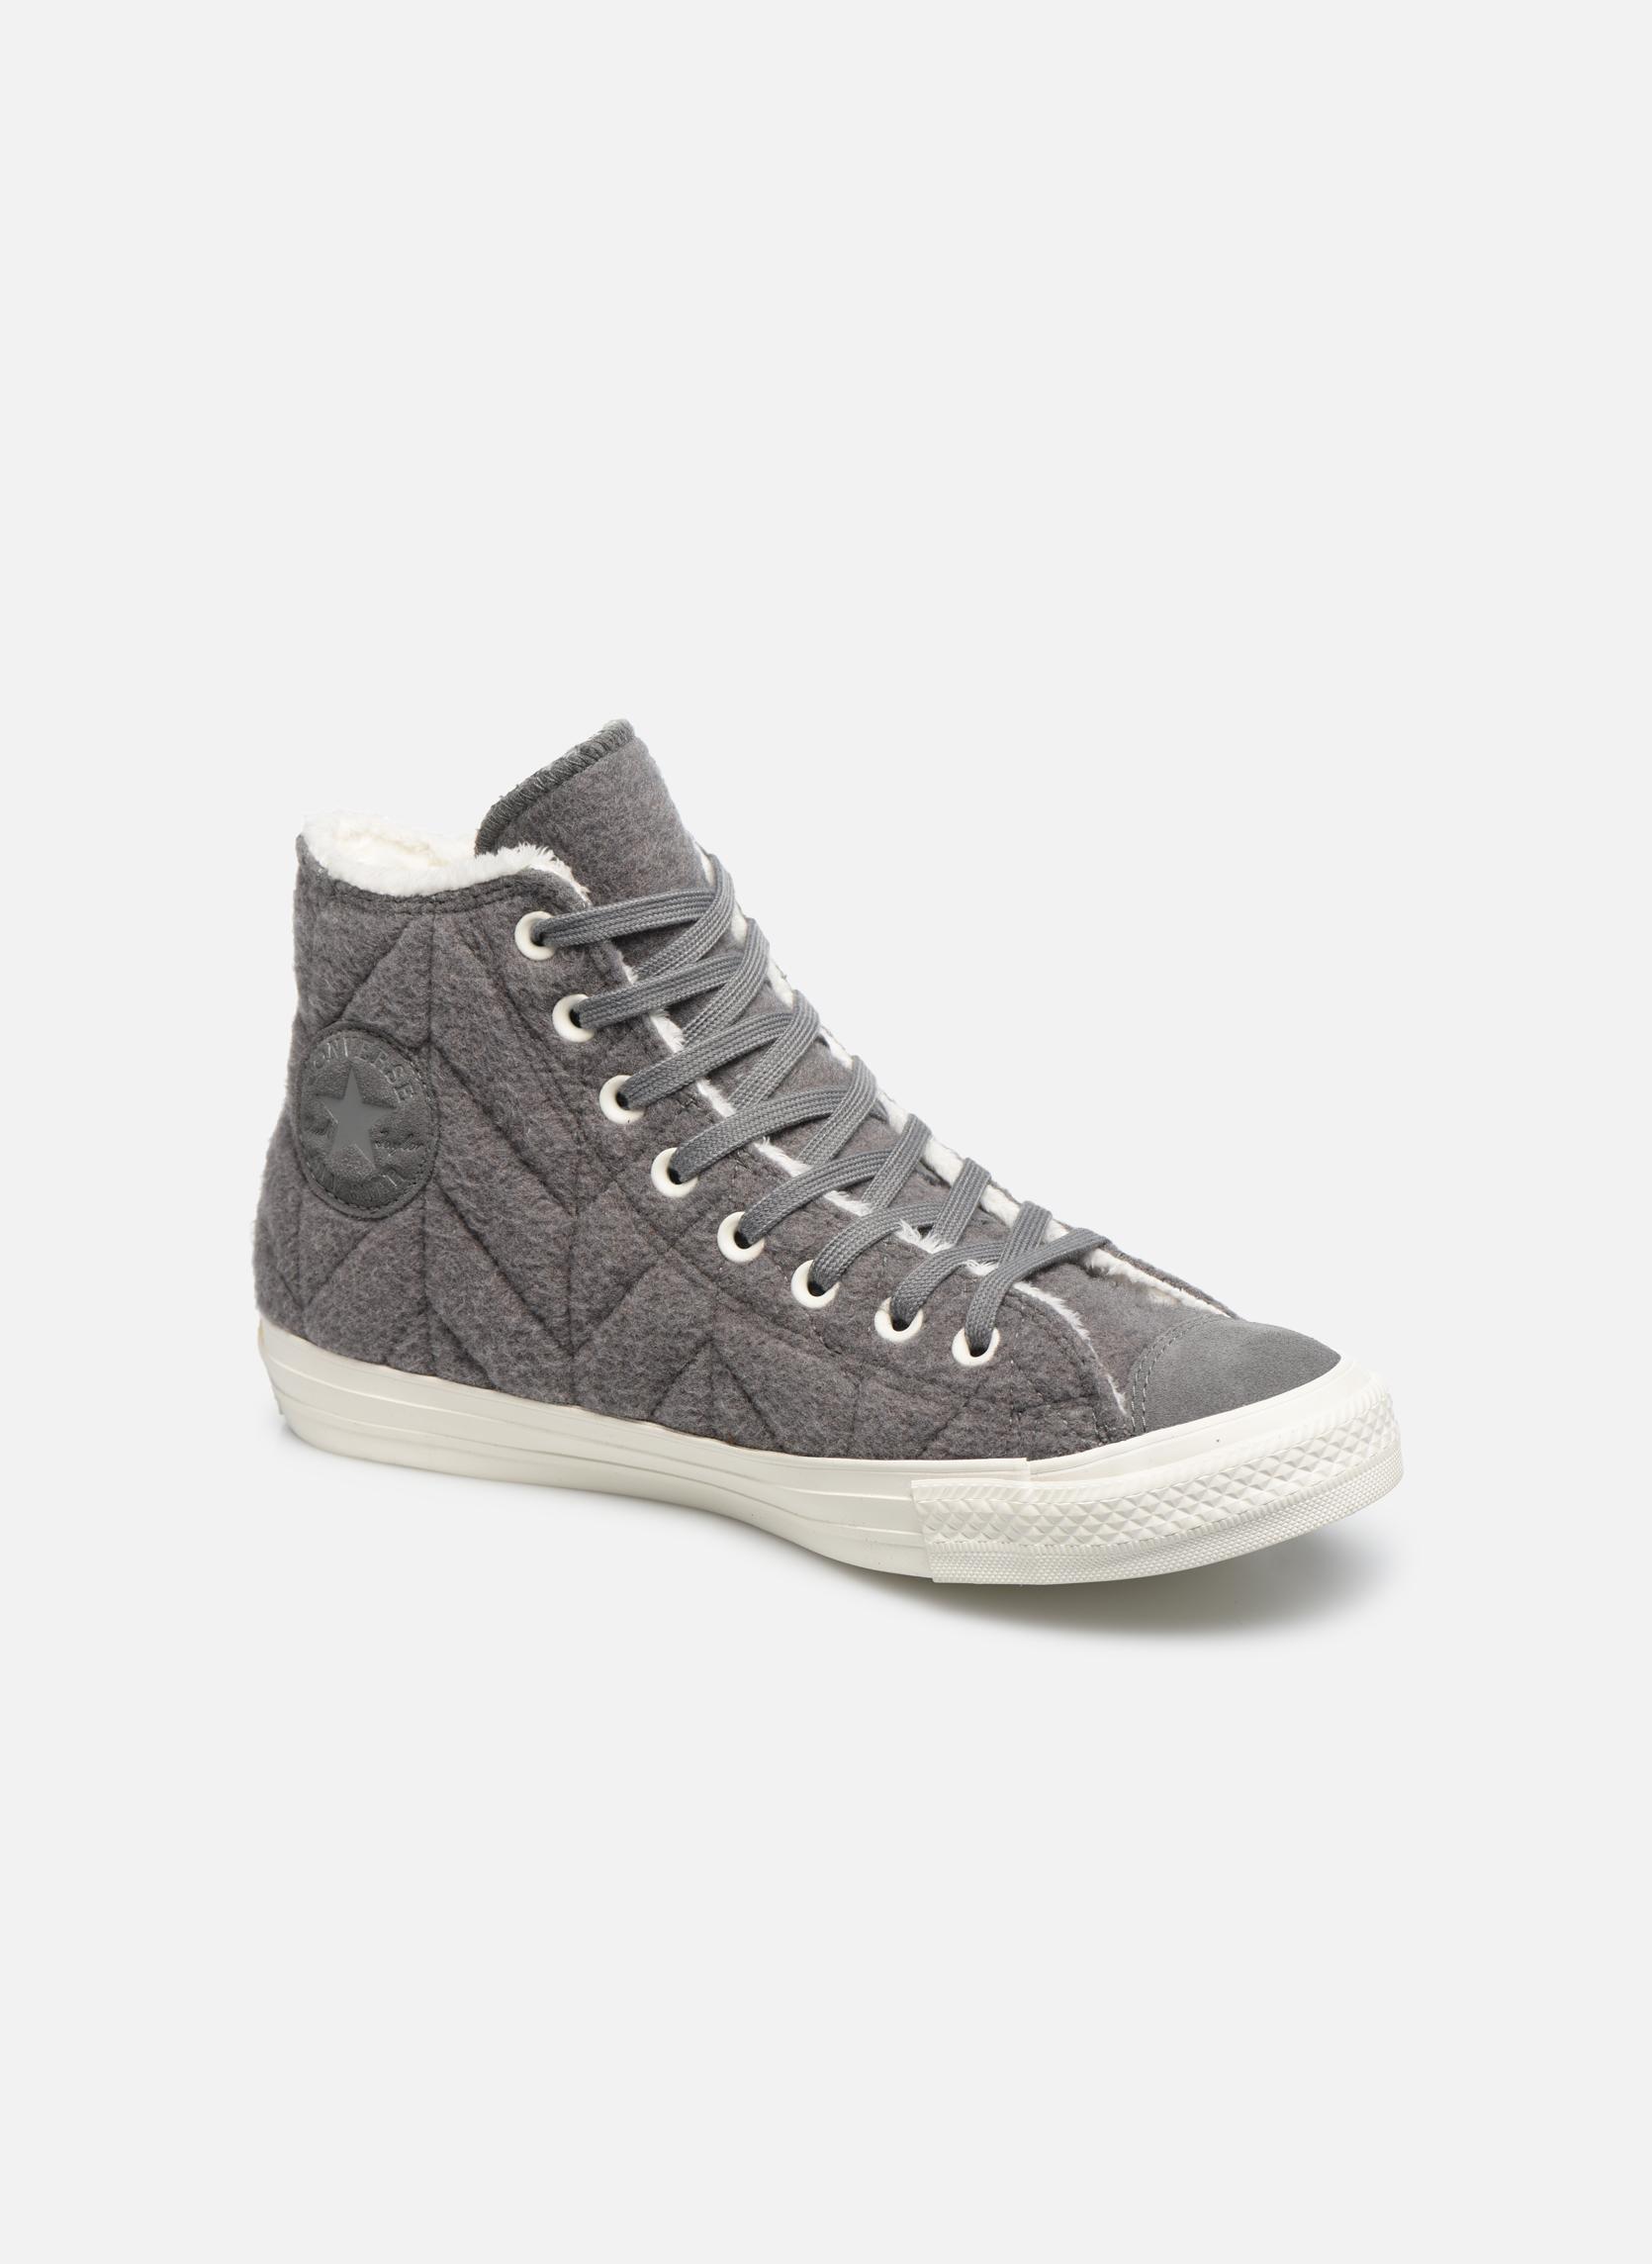 Chuck Taylor All Star Wool Hi Charcoal Grey/Charcoal Grey/Egret